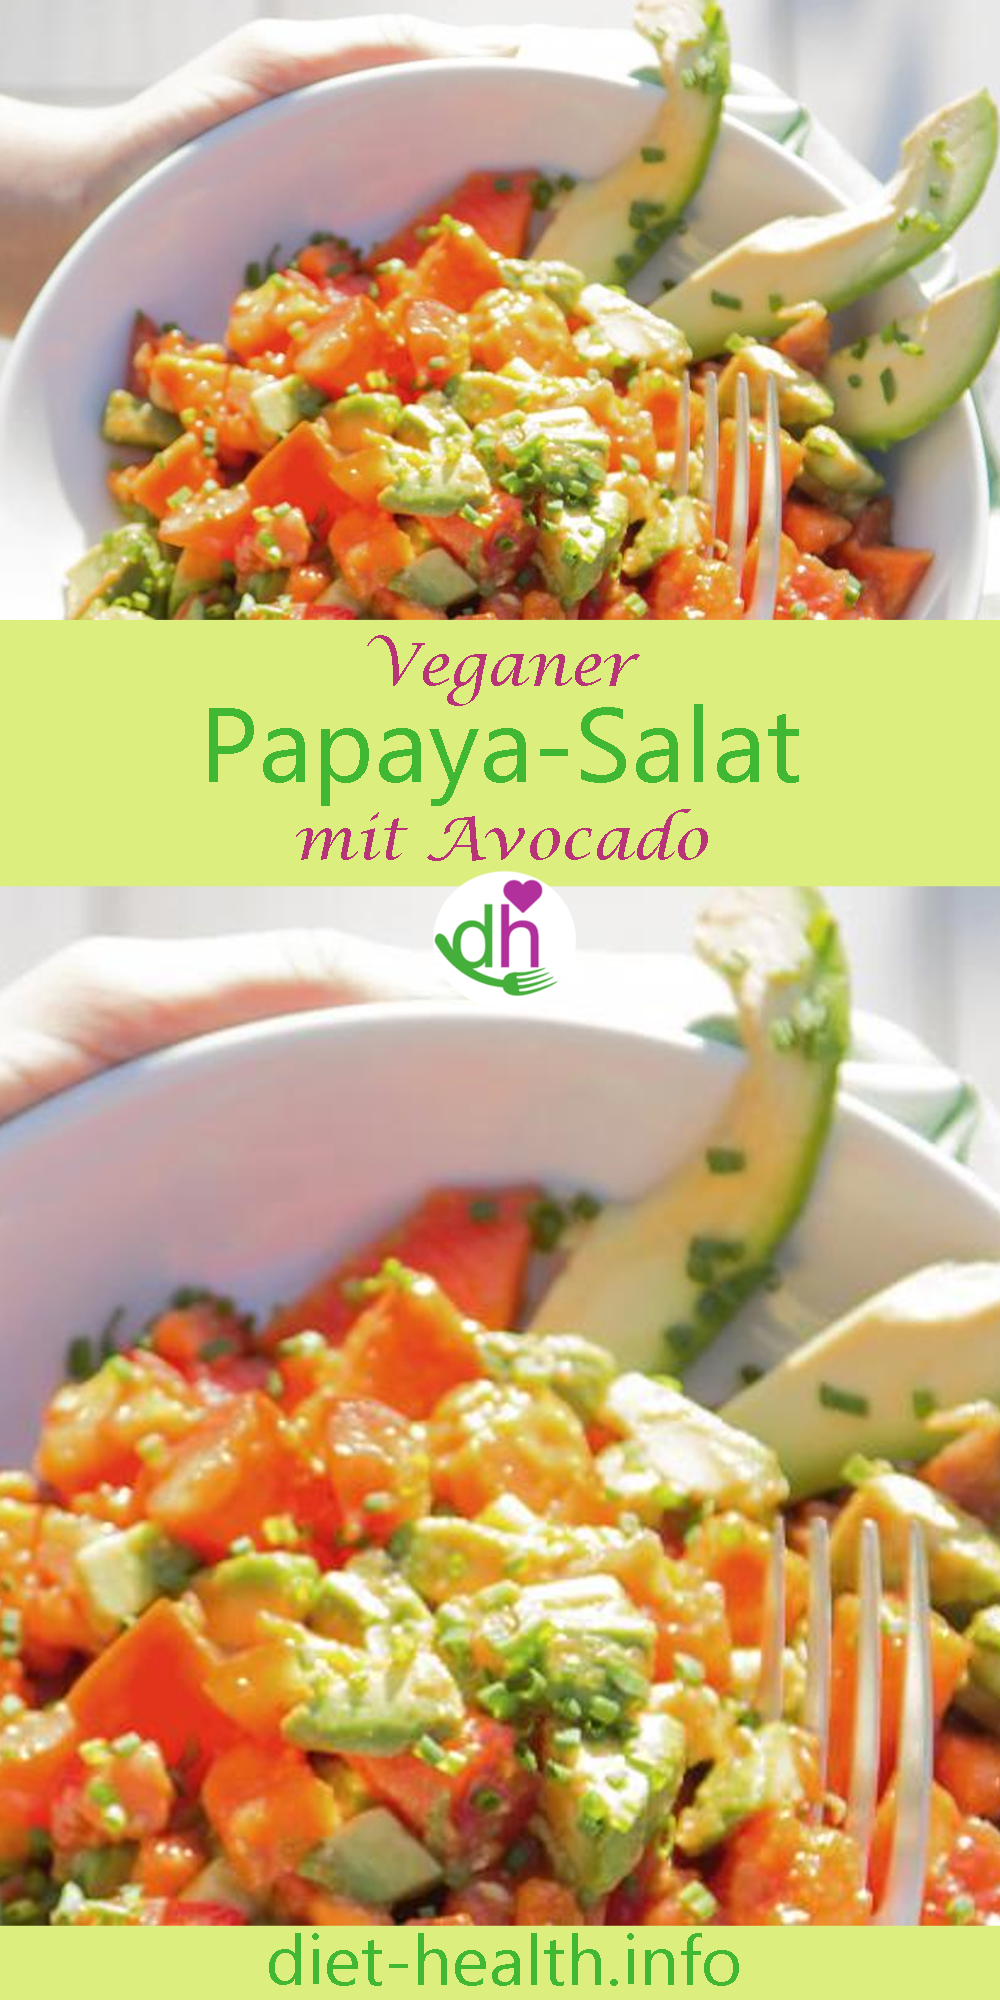 15bb30474e2d031624c3e35d49a297c8 - Papaya Rezepte